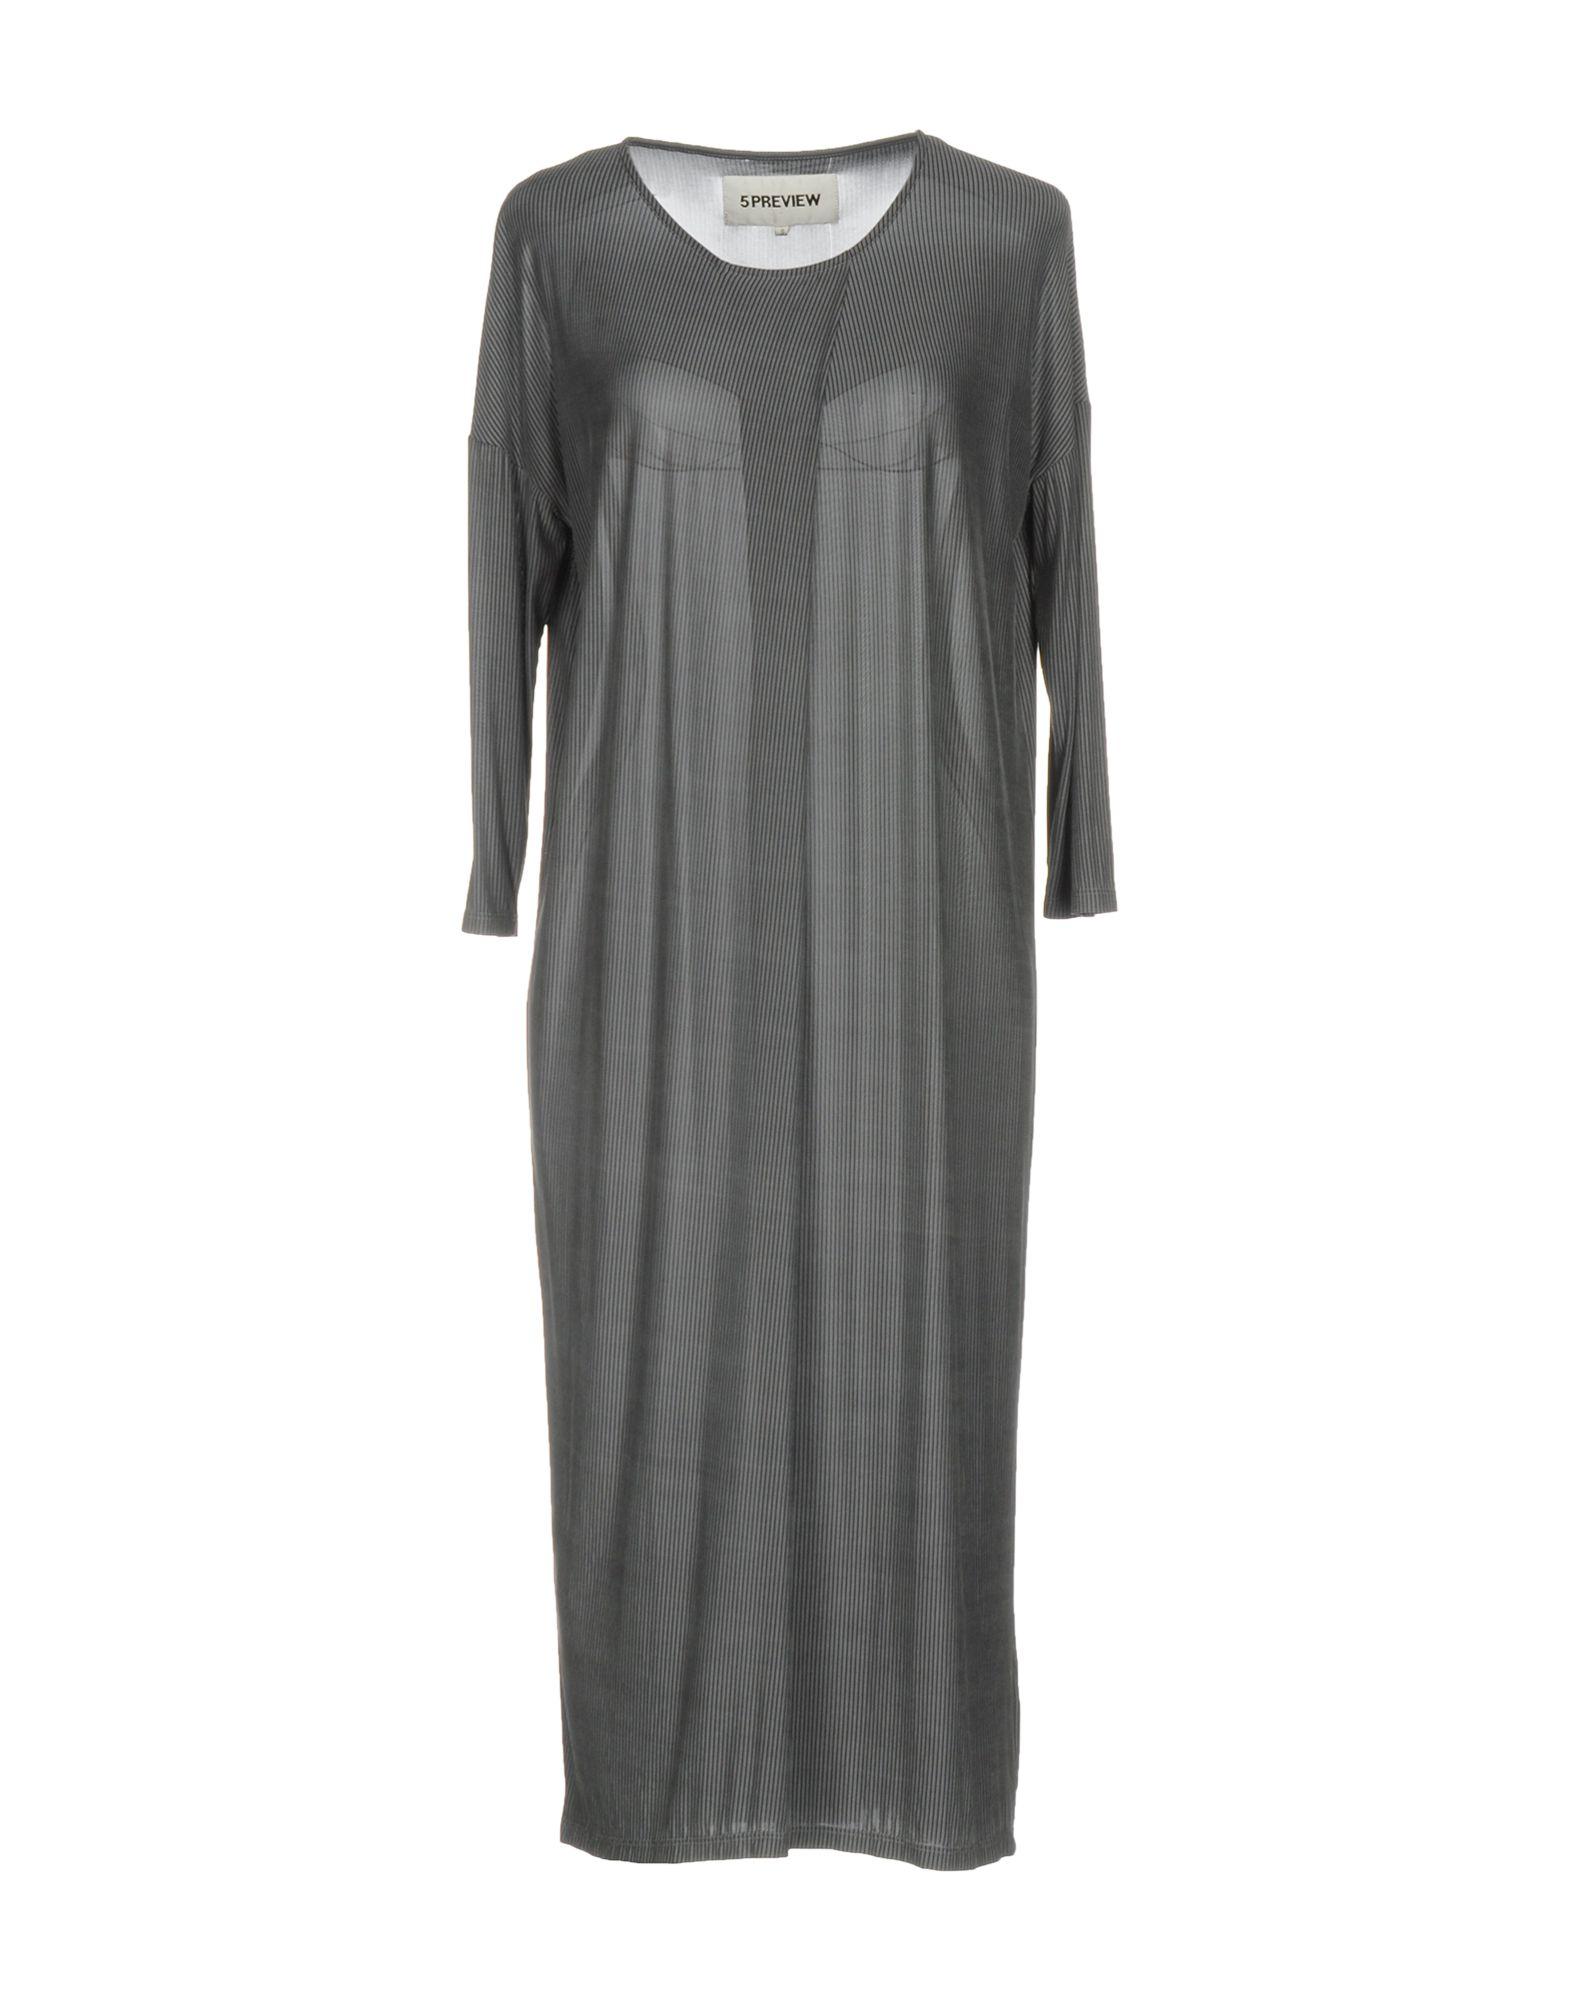 цена 5PREVIEW Платье до колена онлайн в 2017 году